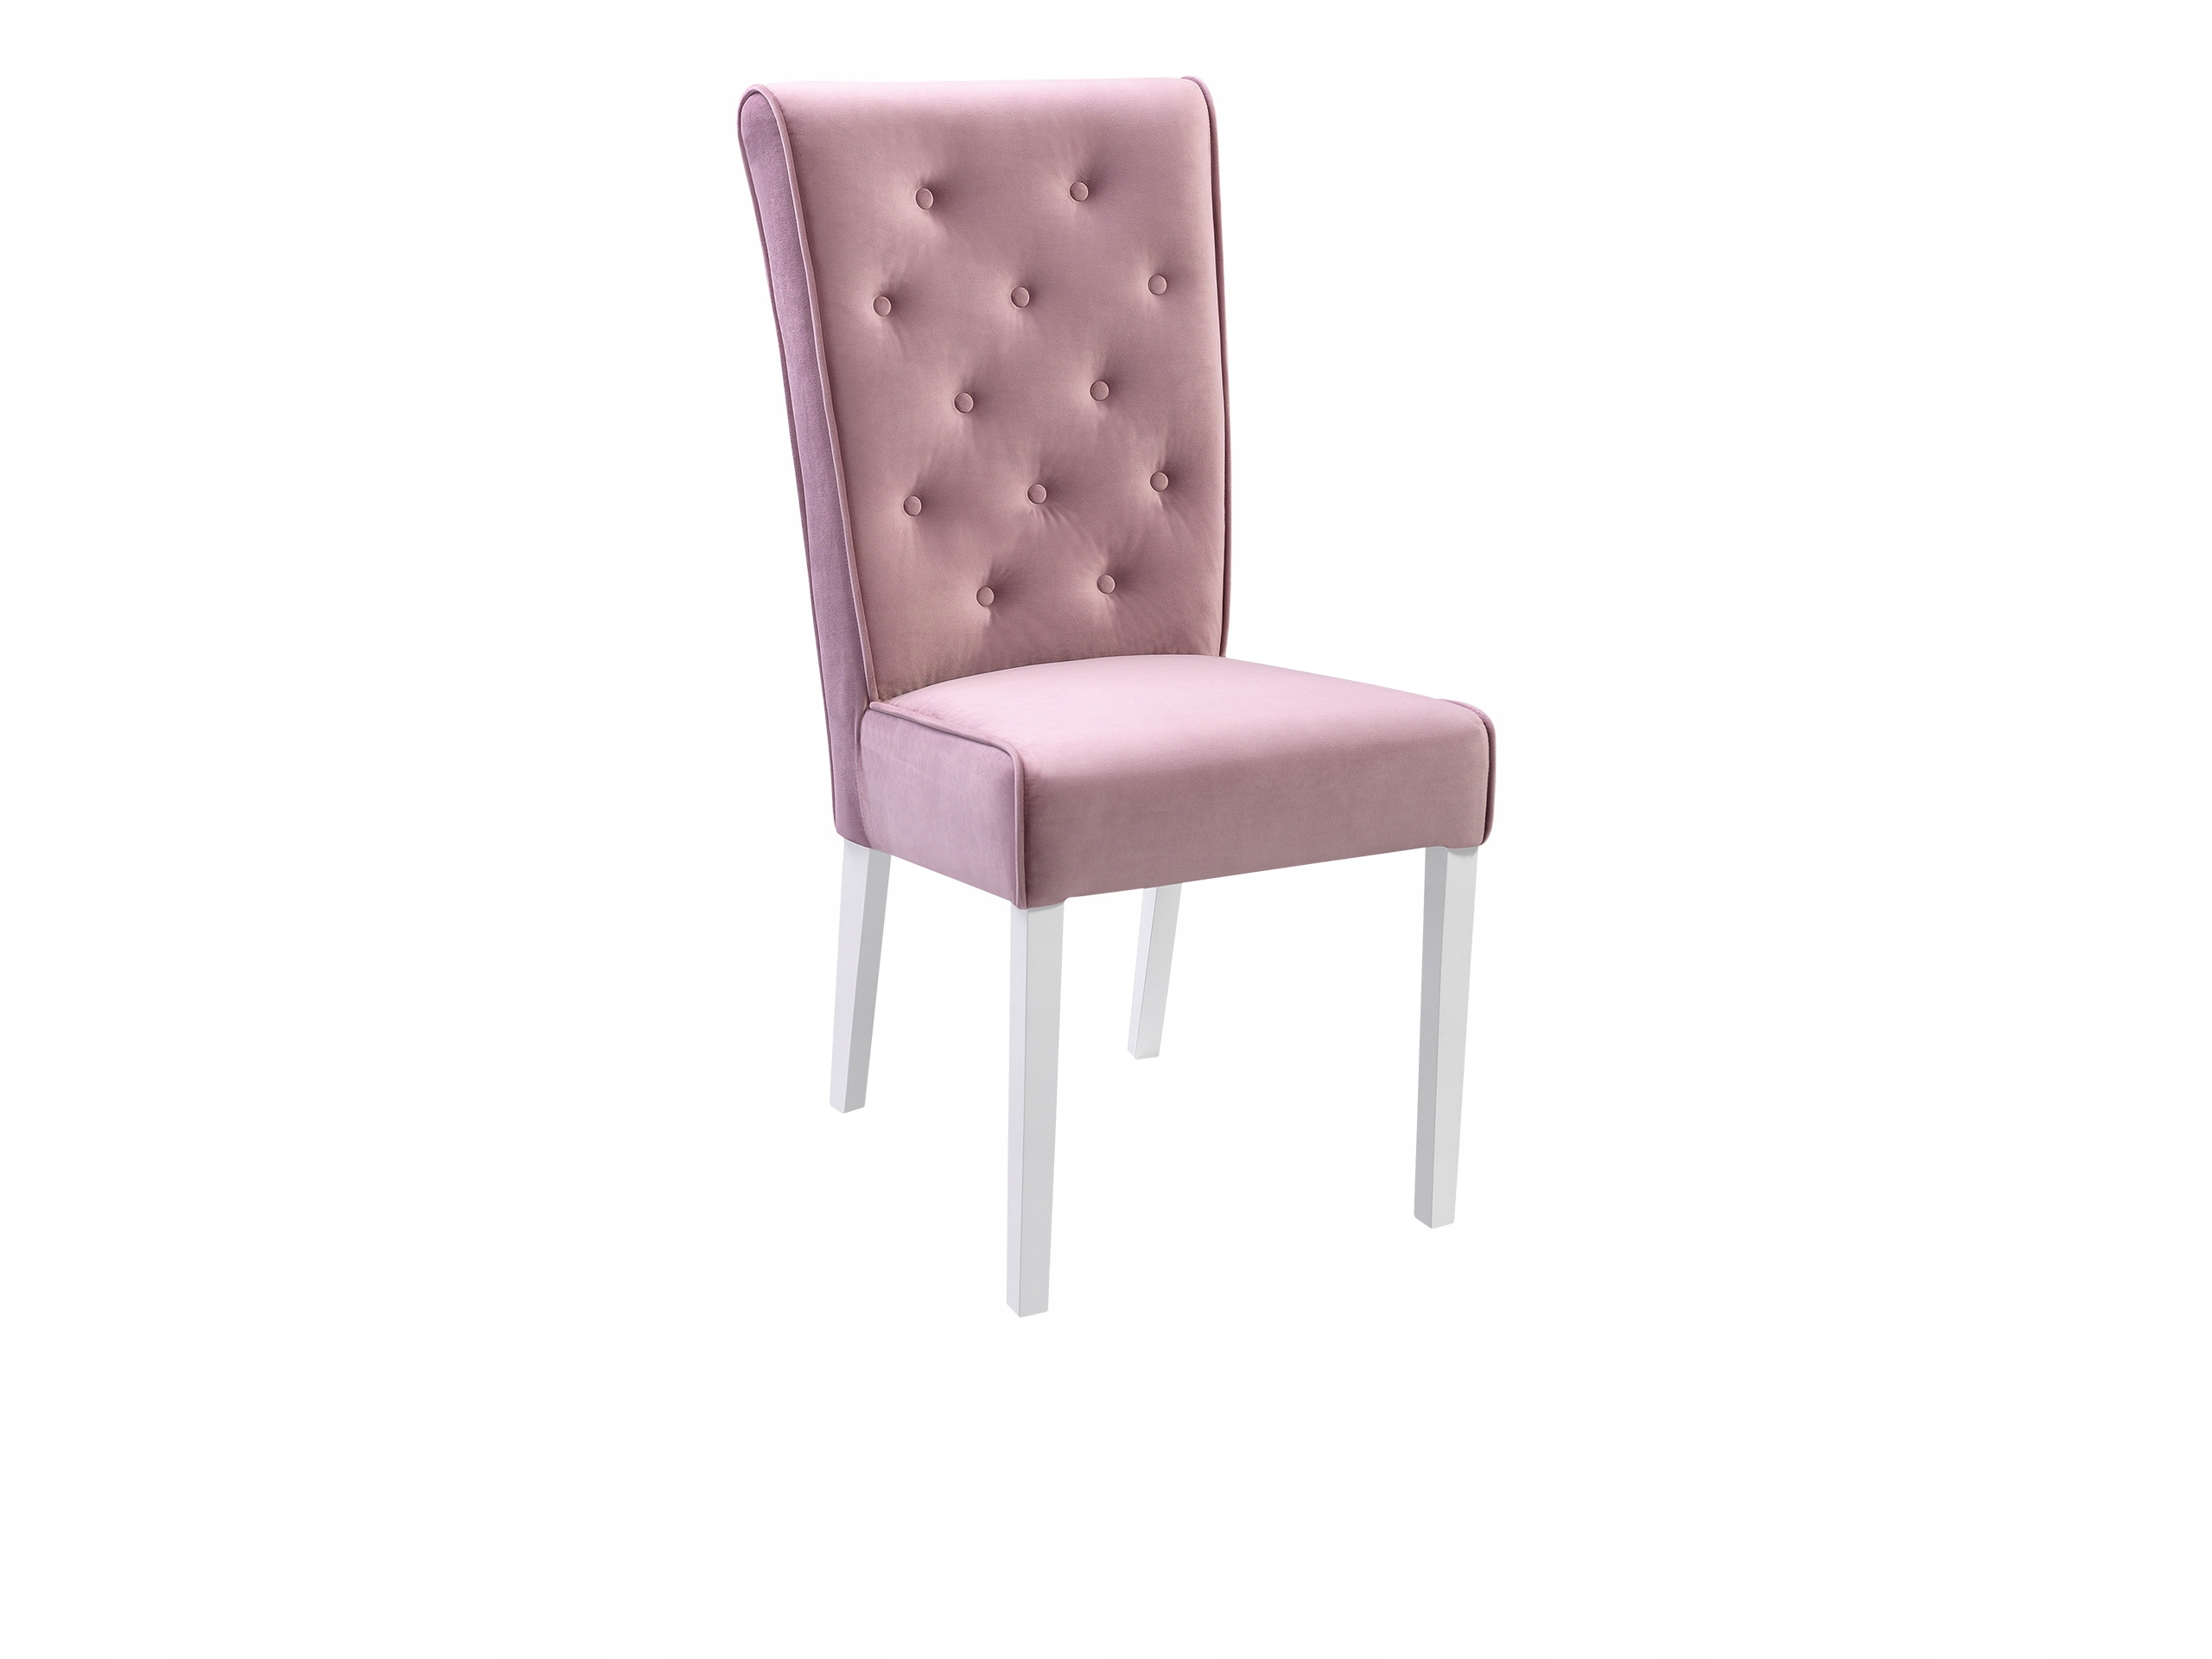 STOLIČKA glamour YORK - pohodlné KRESLO pre obývacia izba